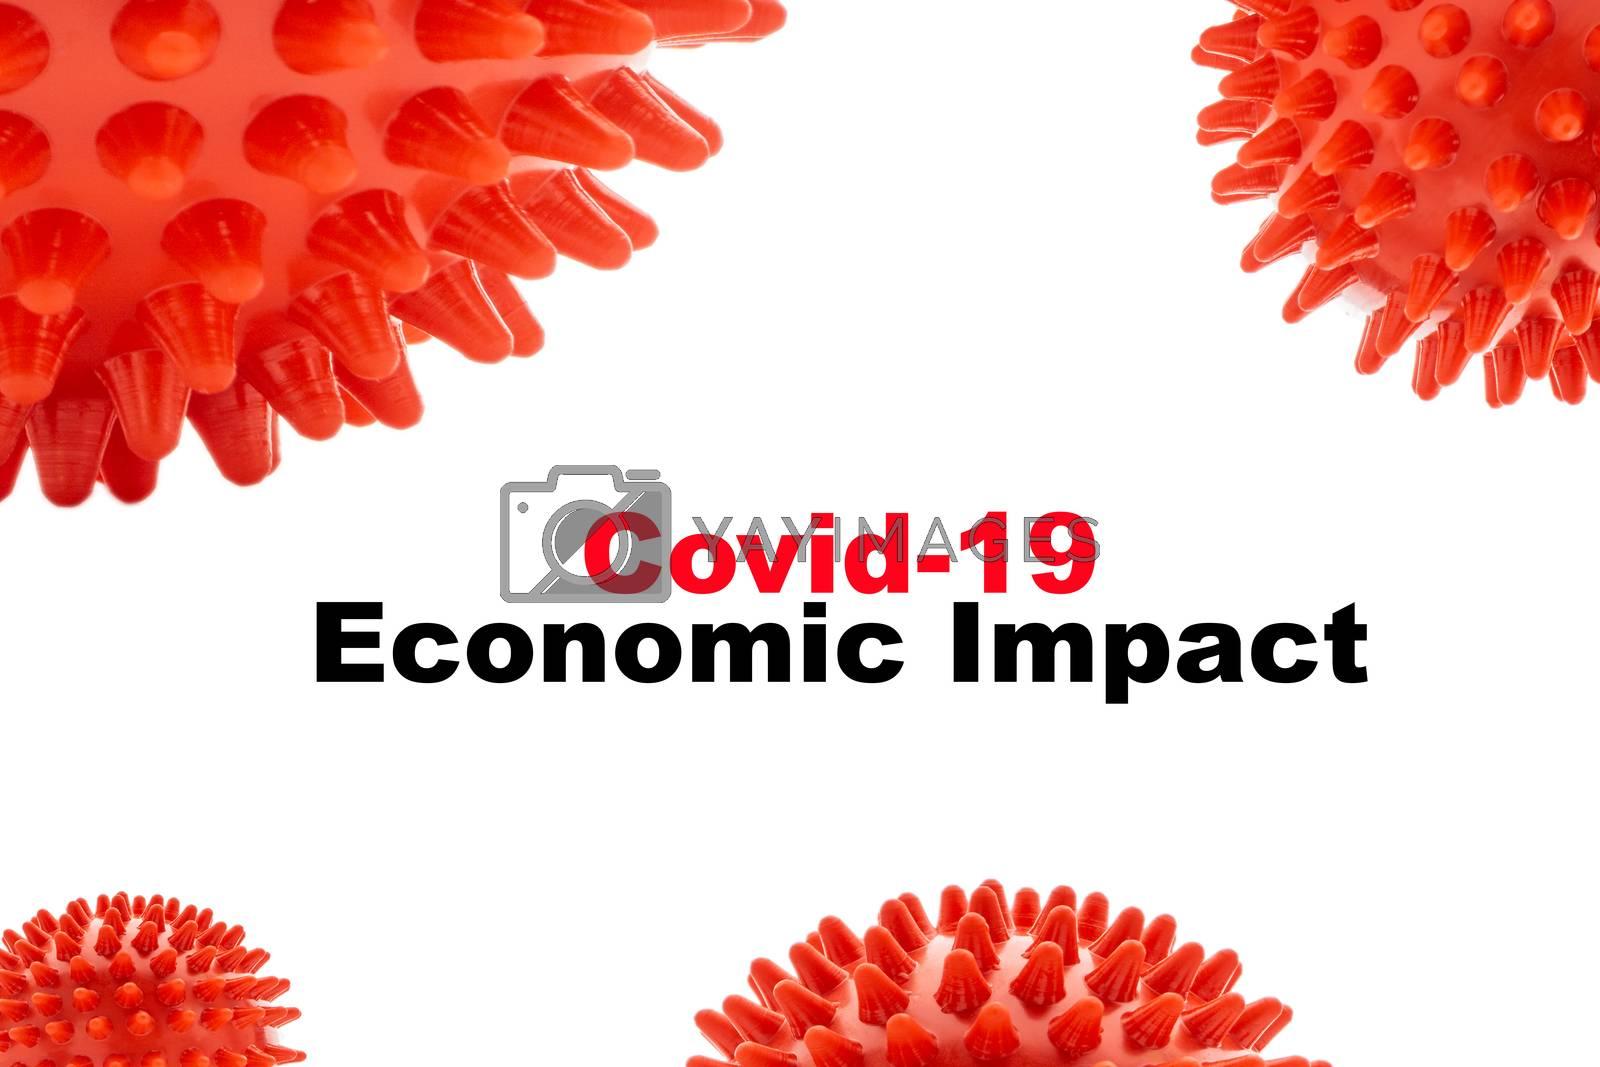 COVID-19 ECONOMIC IMPACT text on white background. Covid-19 or Coronavirus concept